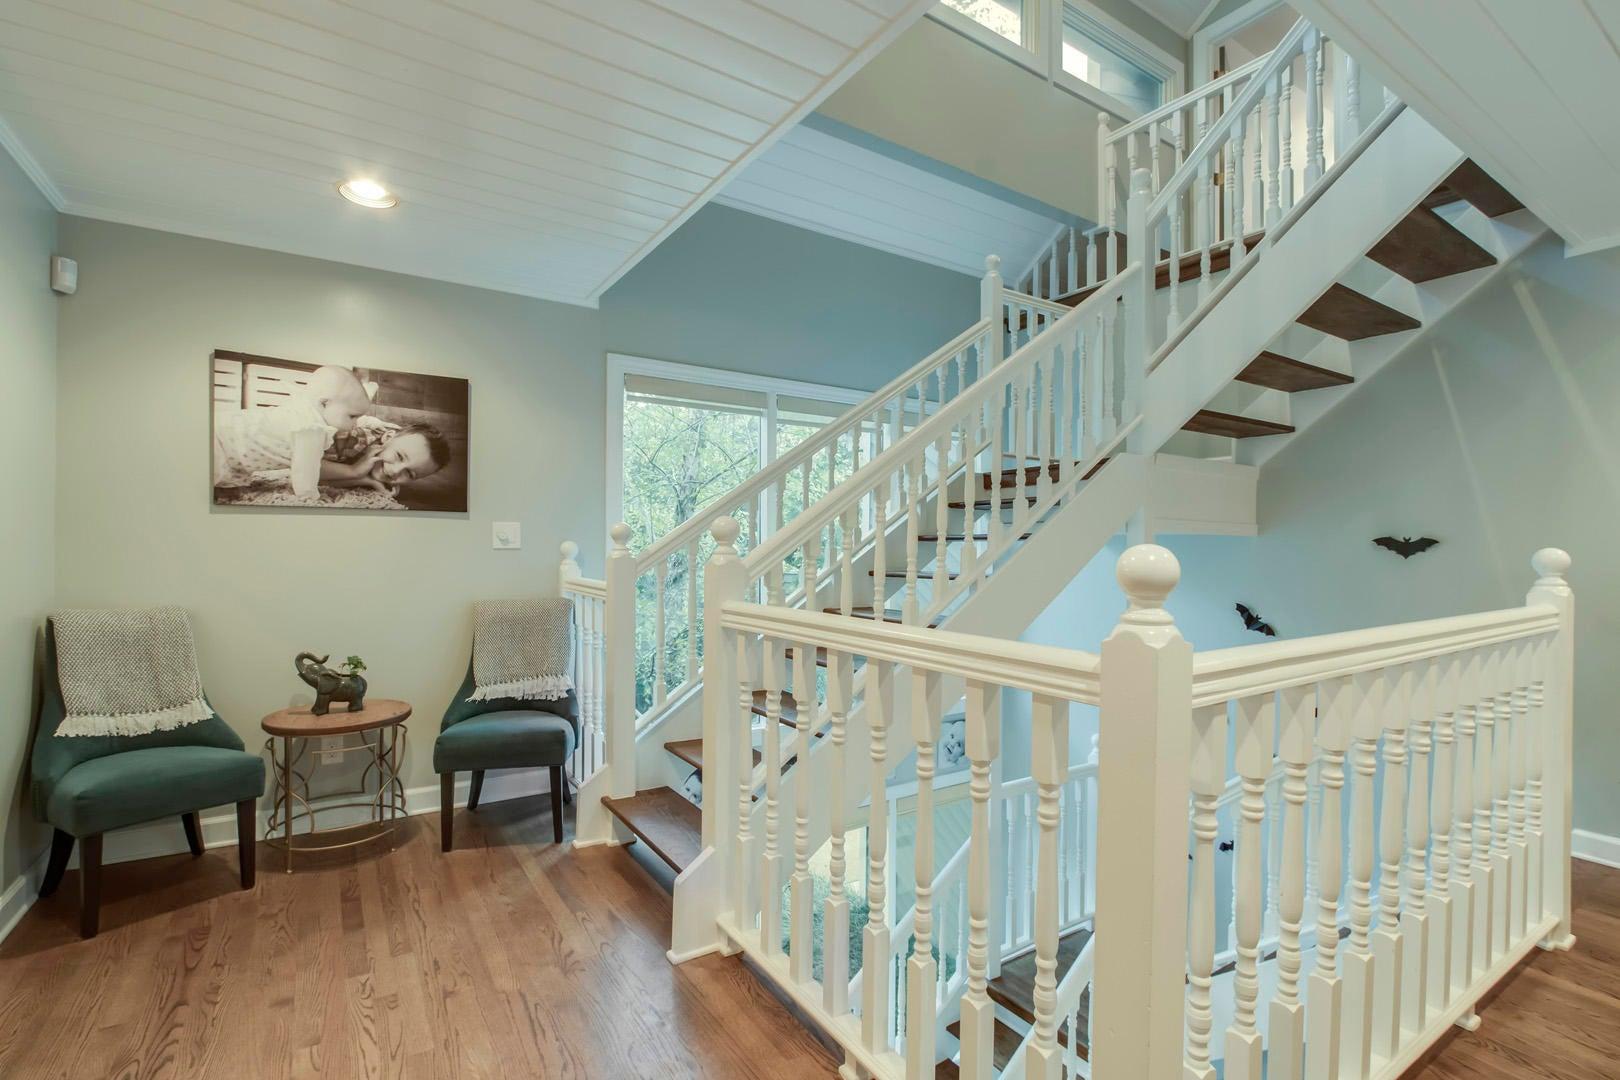 25_OakhurstDriveSW_431_L2-StairsUp